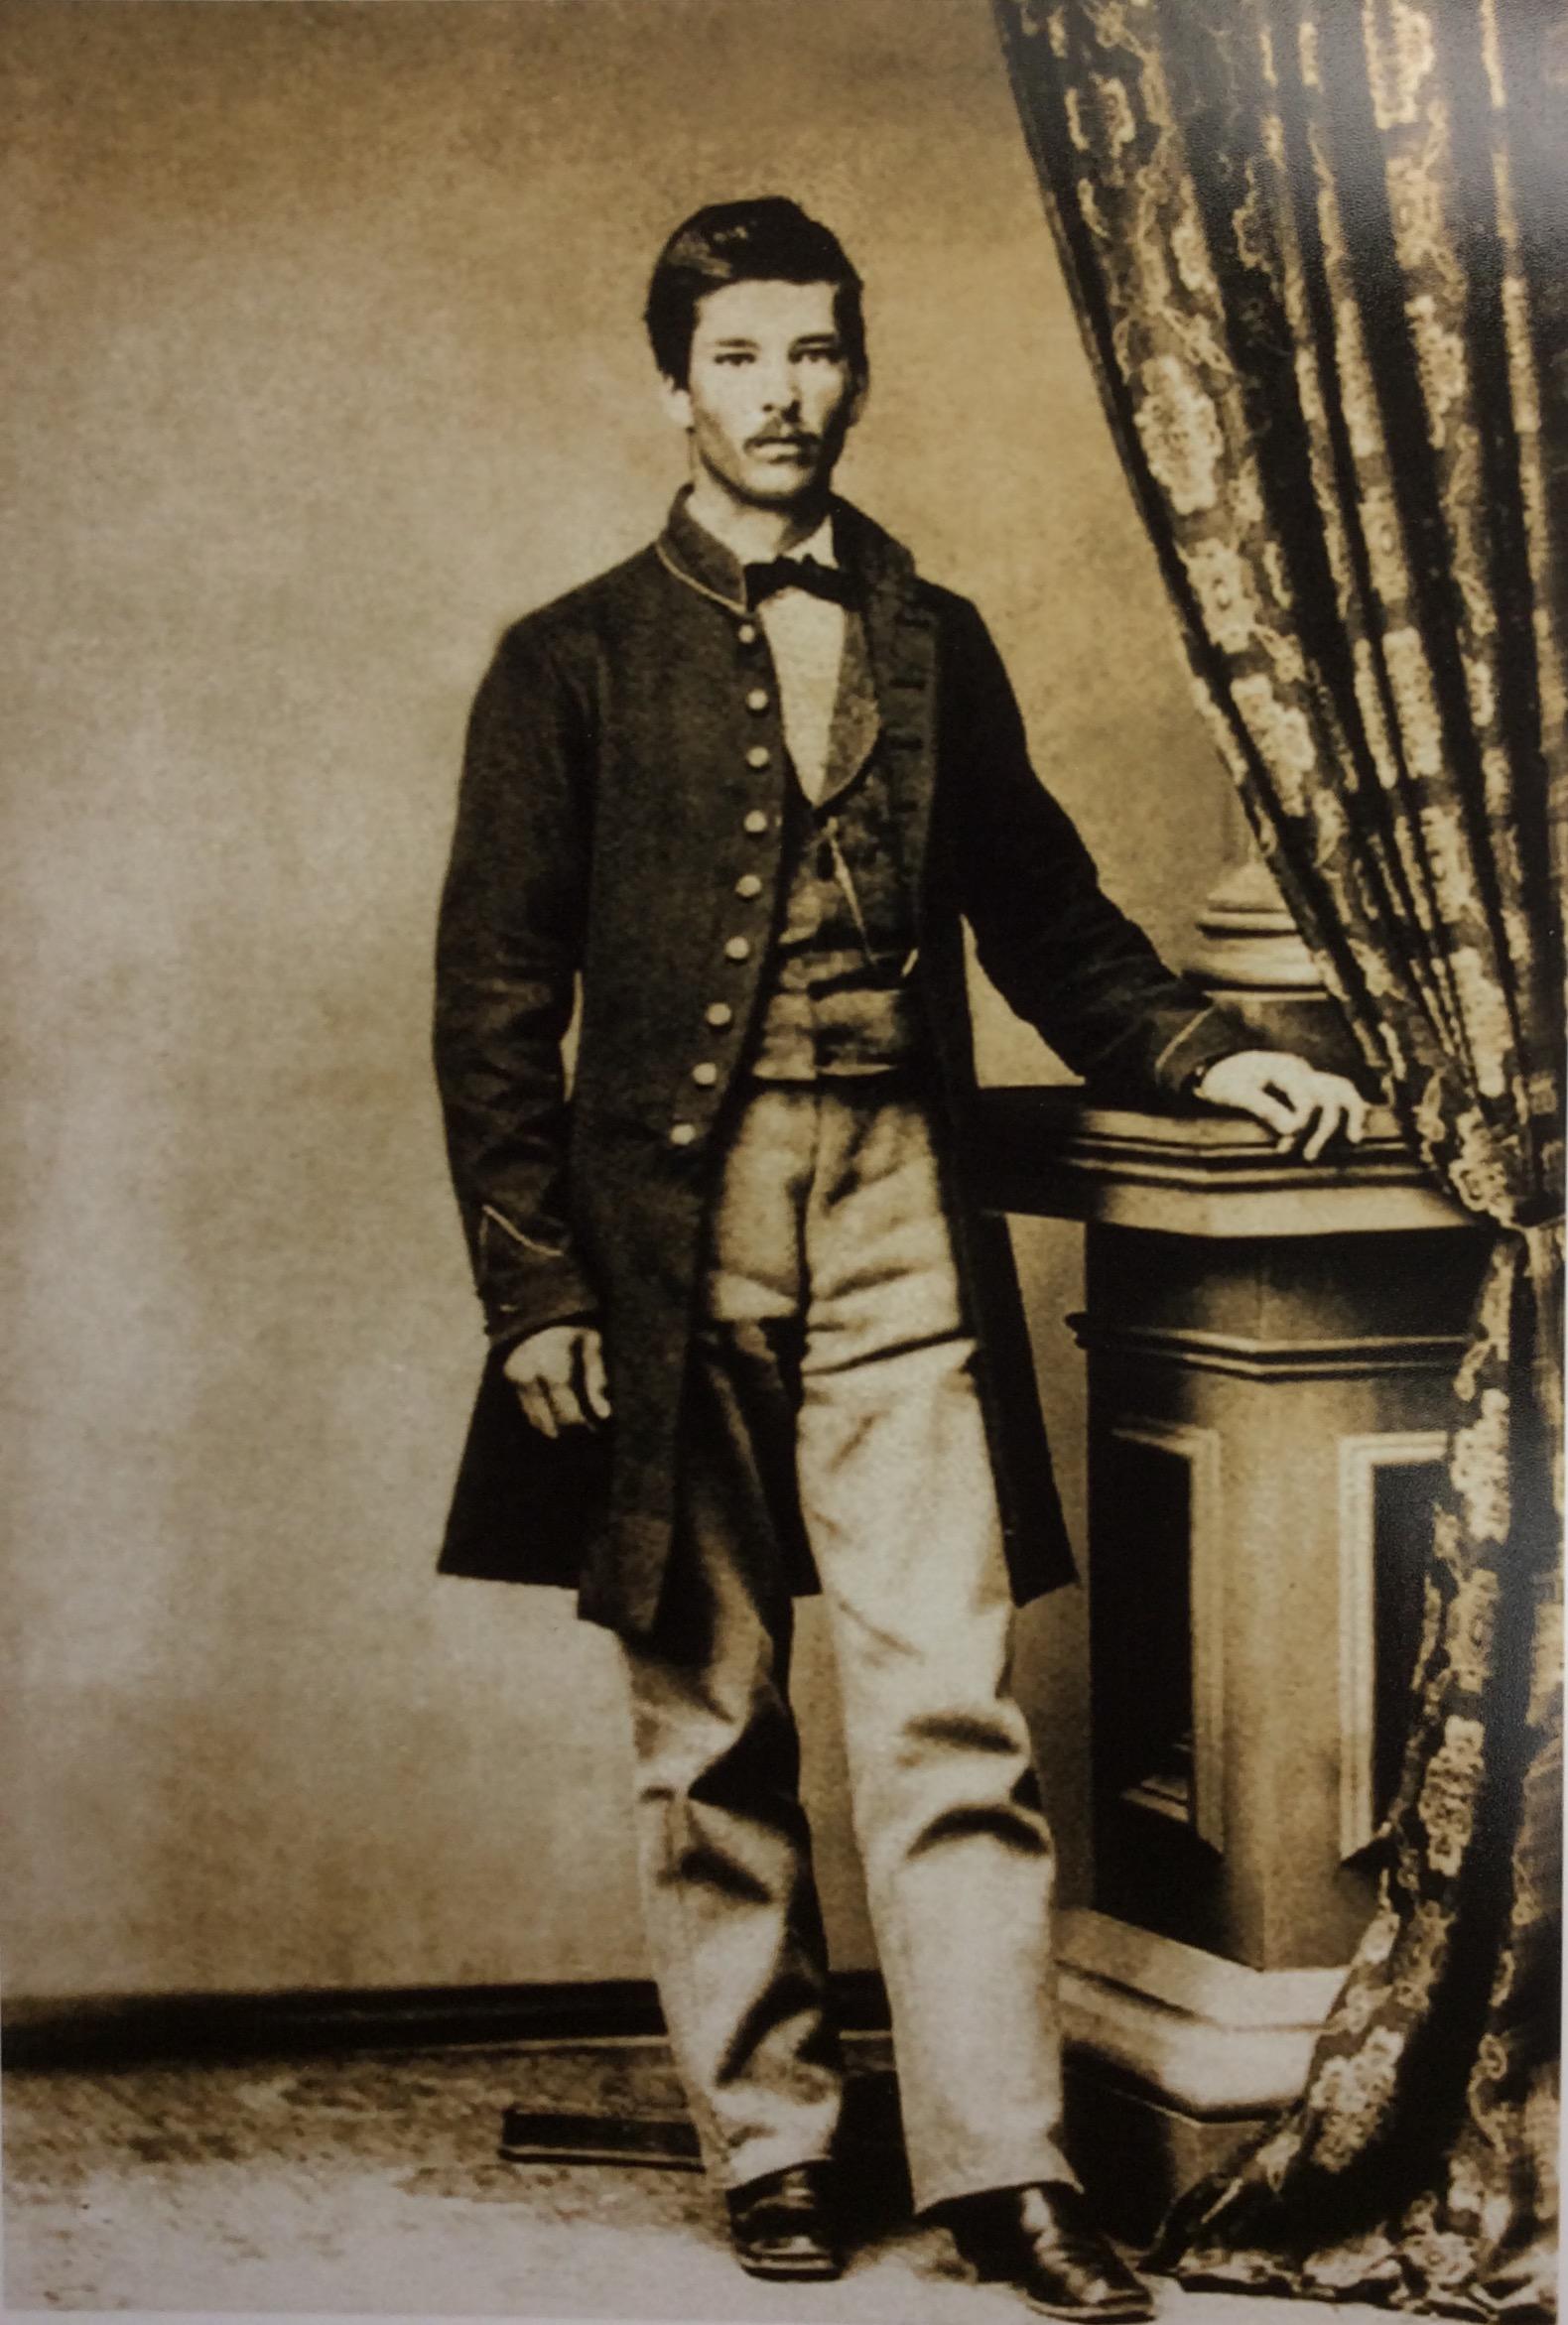 Charles Hamilton Raven, Greg's great-great grandfather.